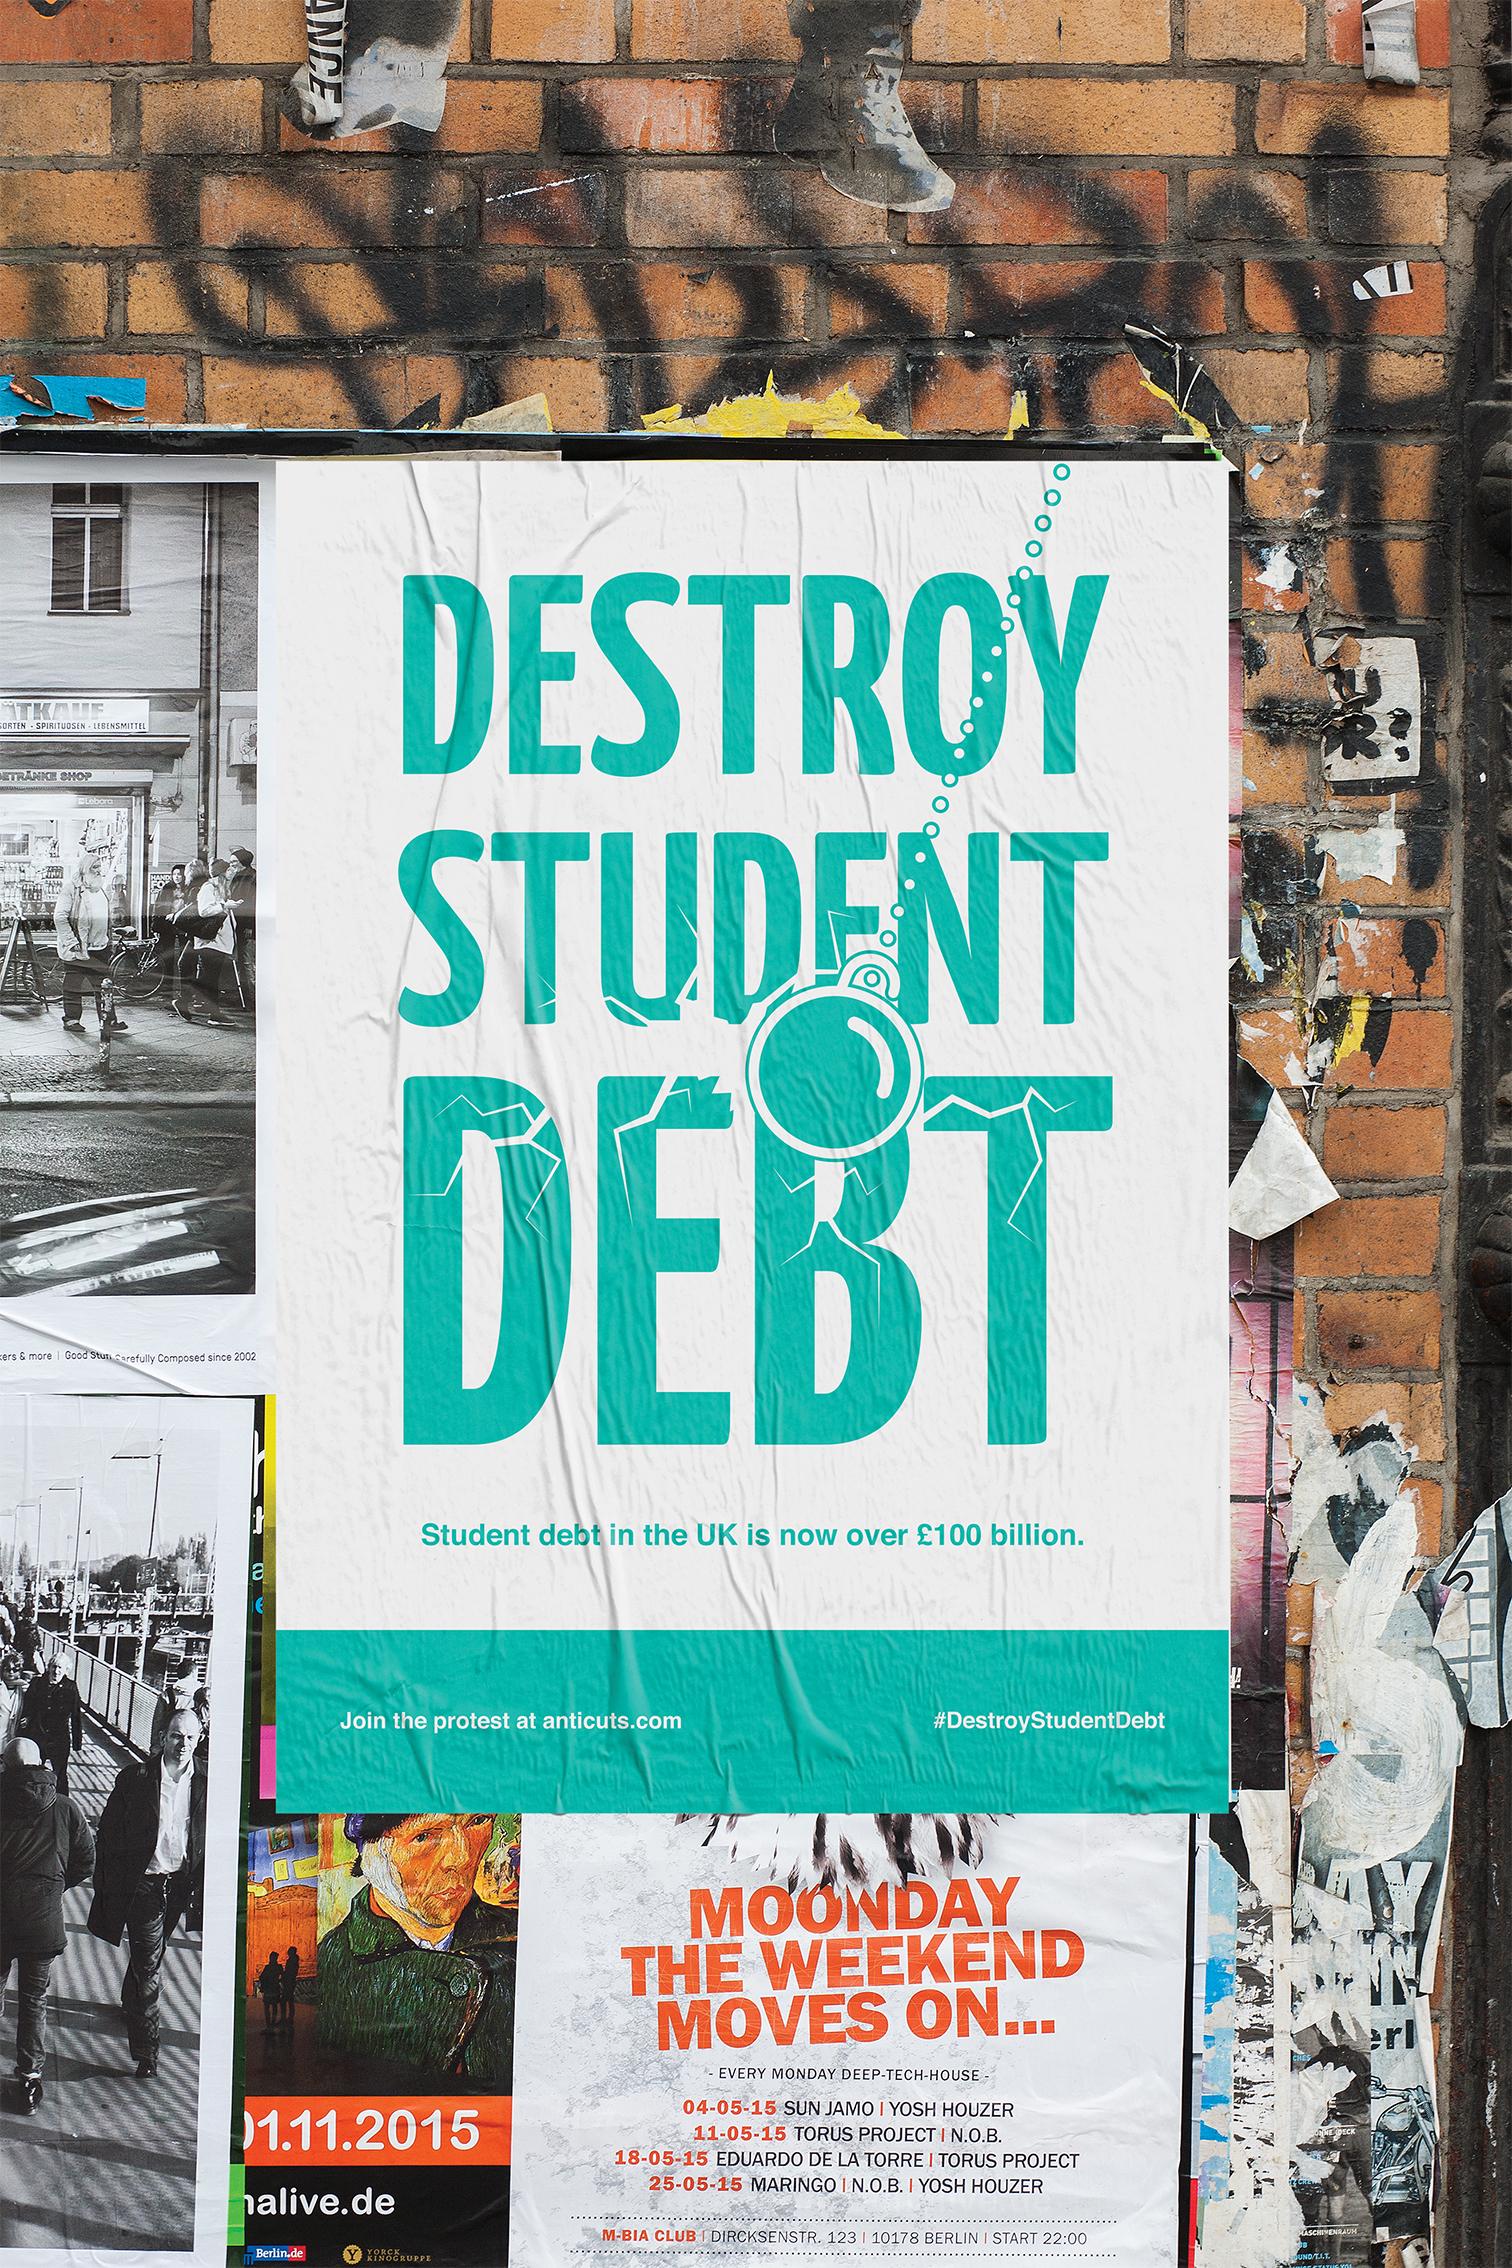 Destroy Student Debt